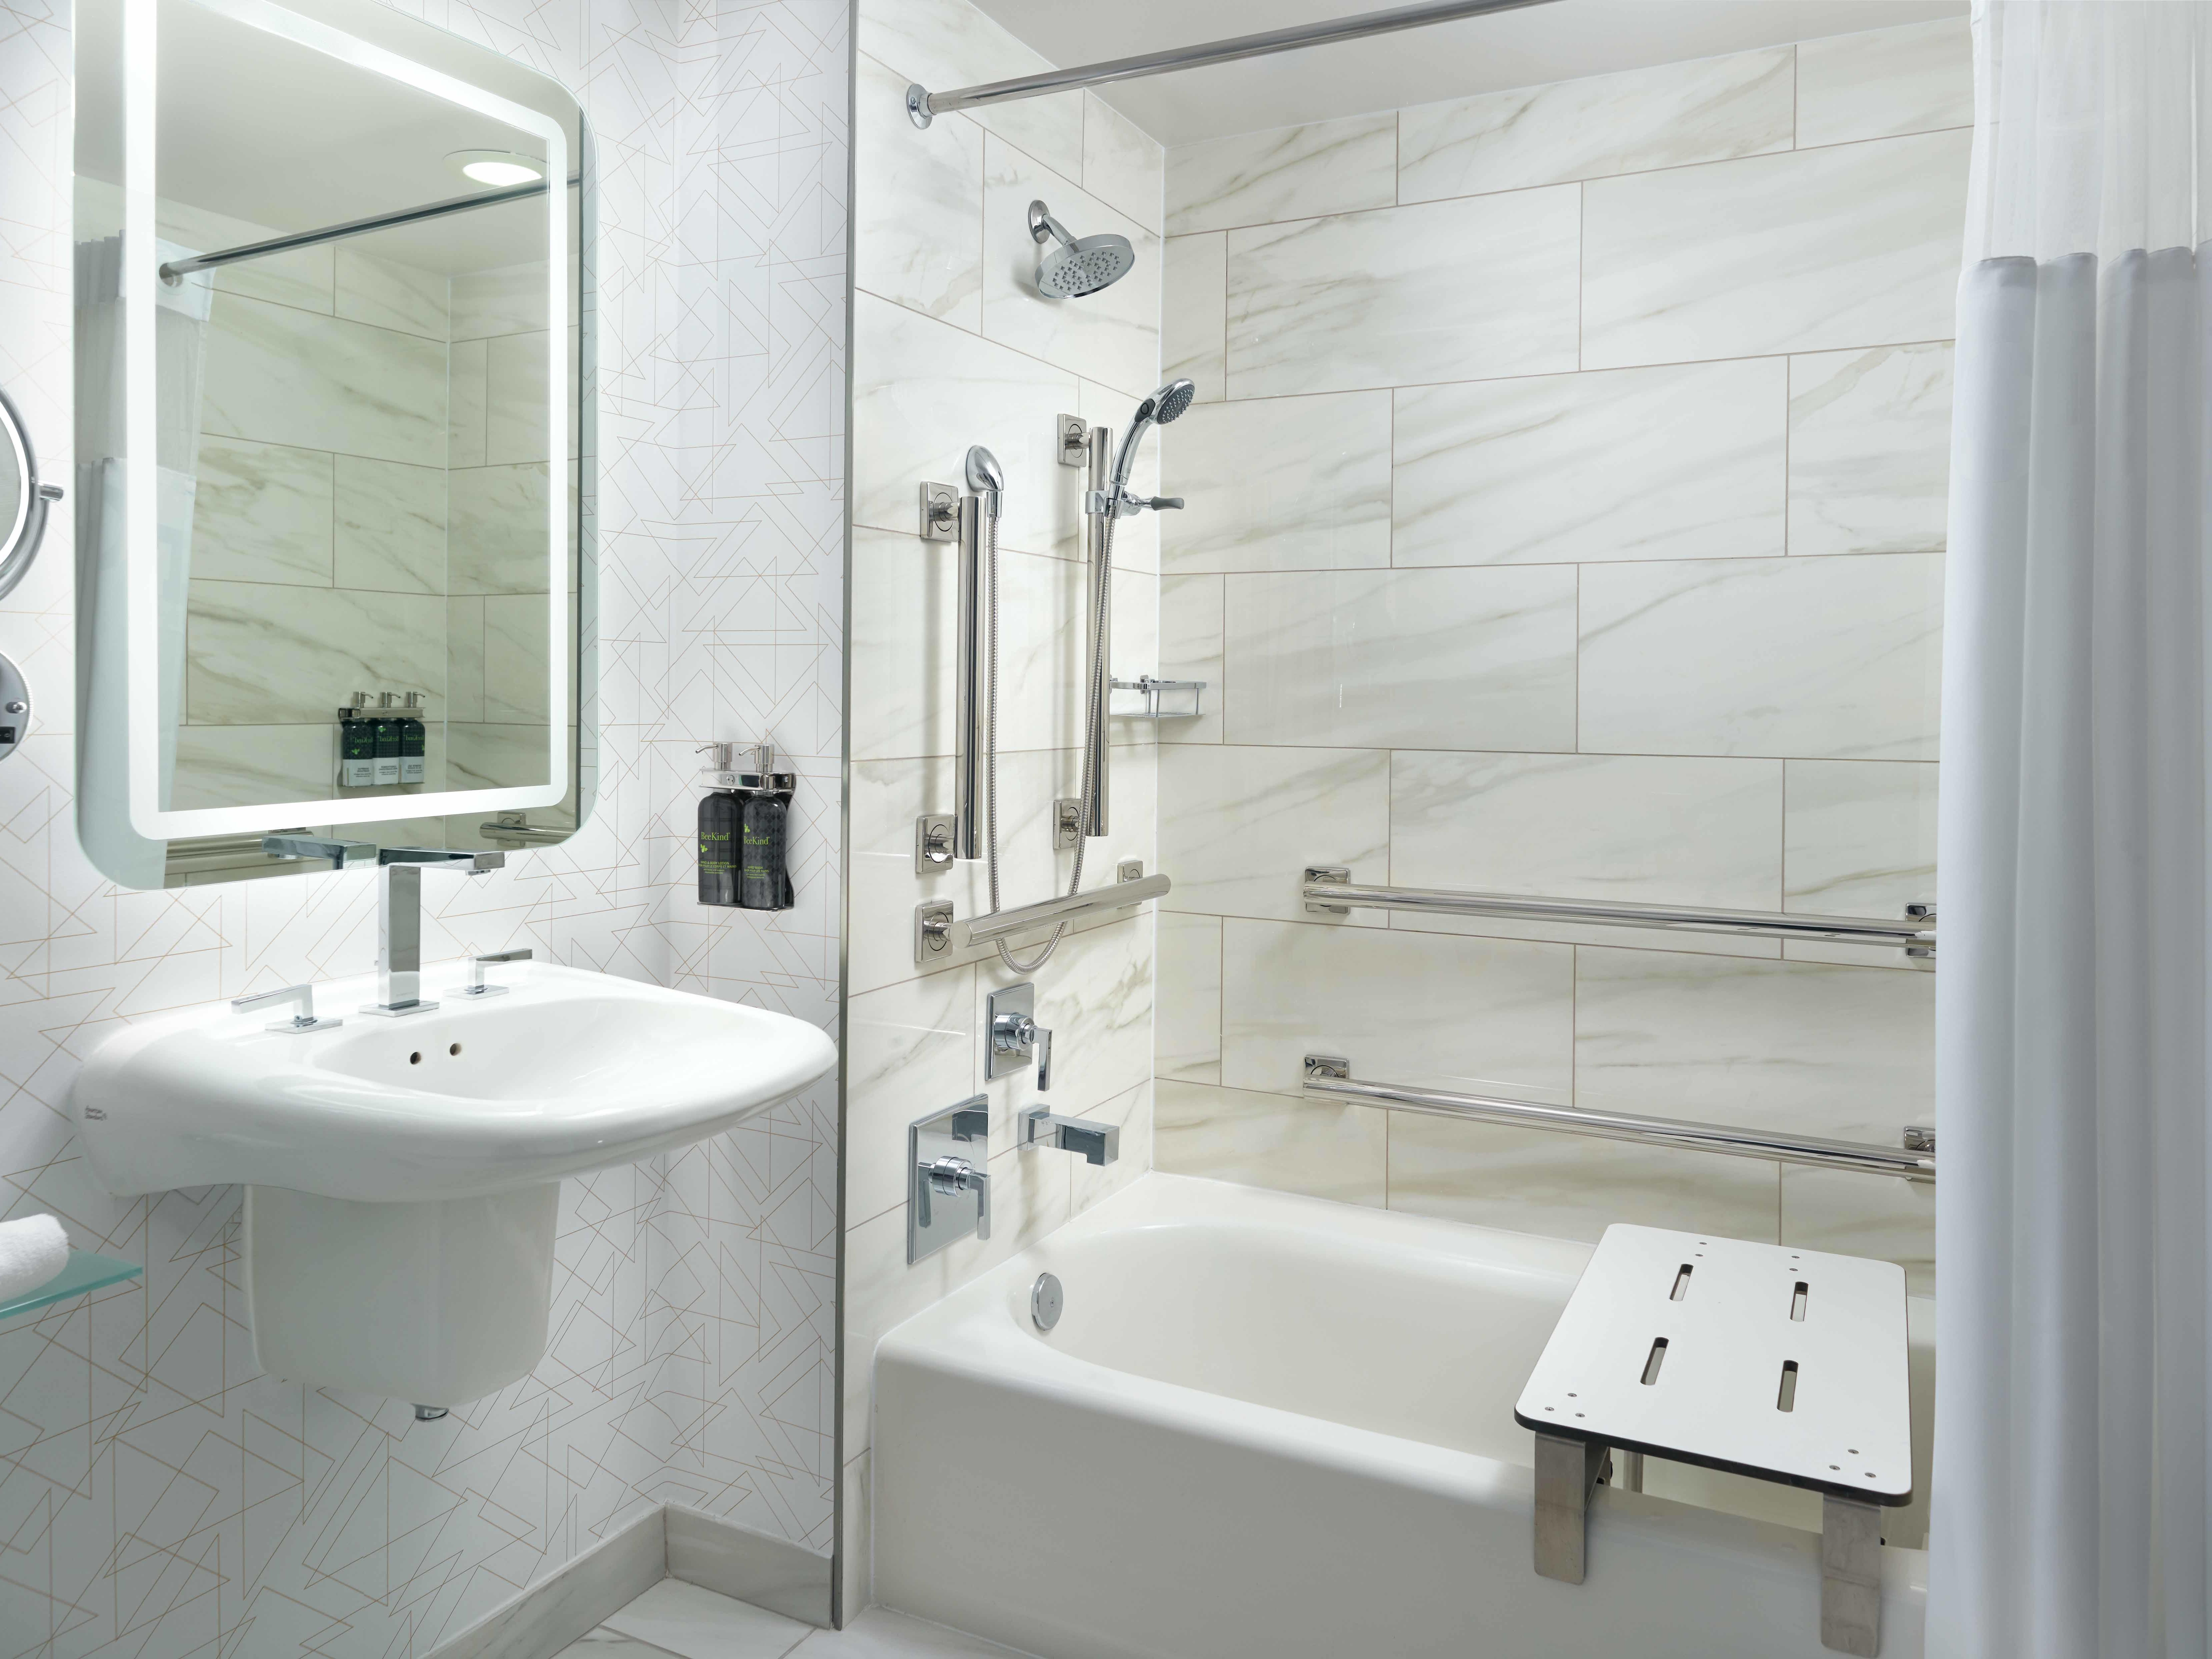 Georgia Tech Hotel Accessible Bathroom